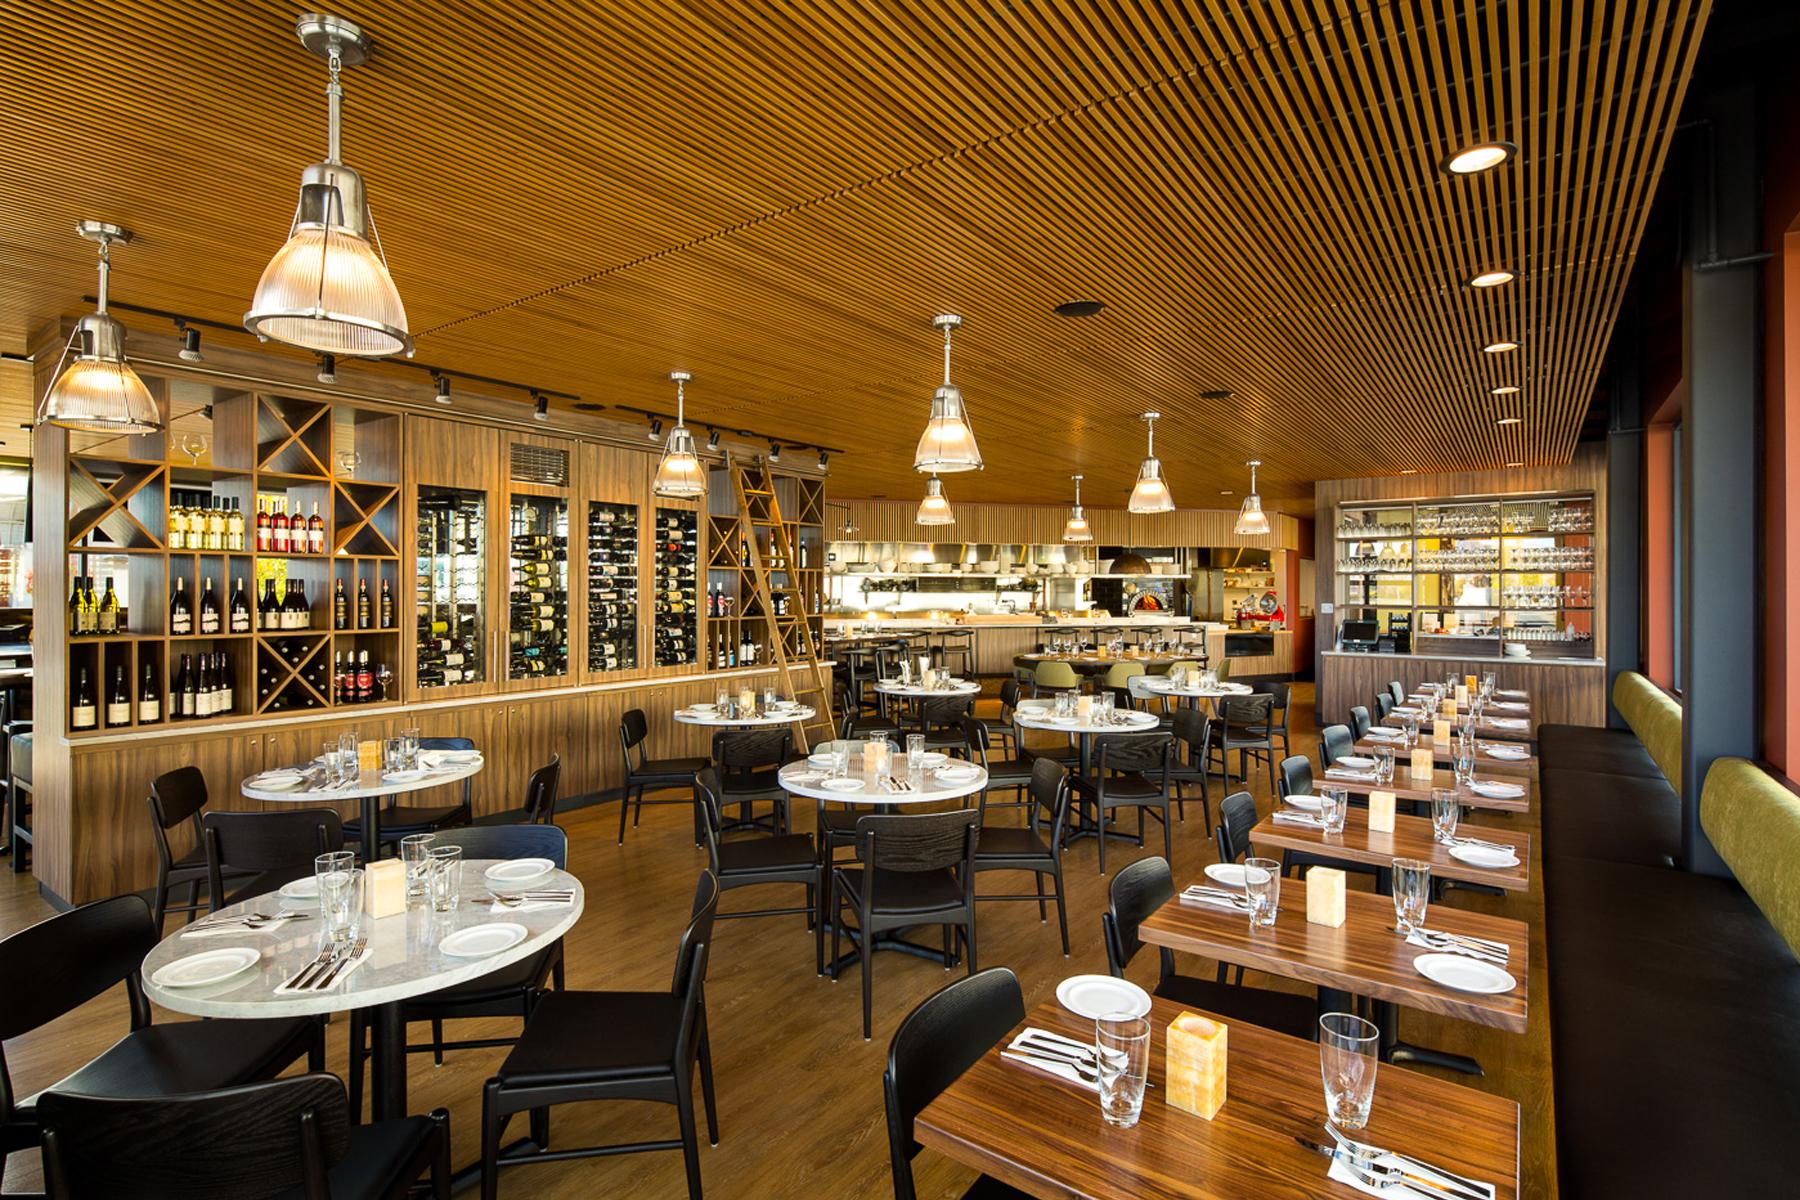 Cafe Mercato dining area